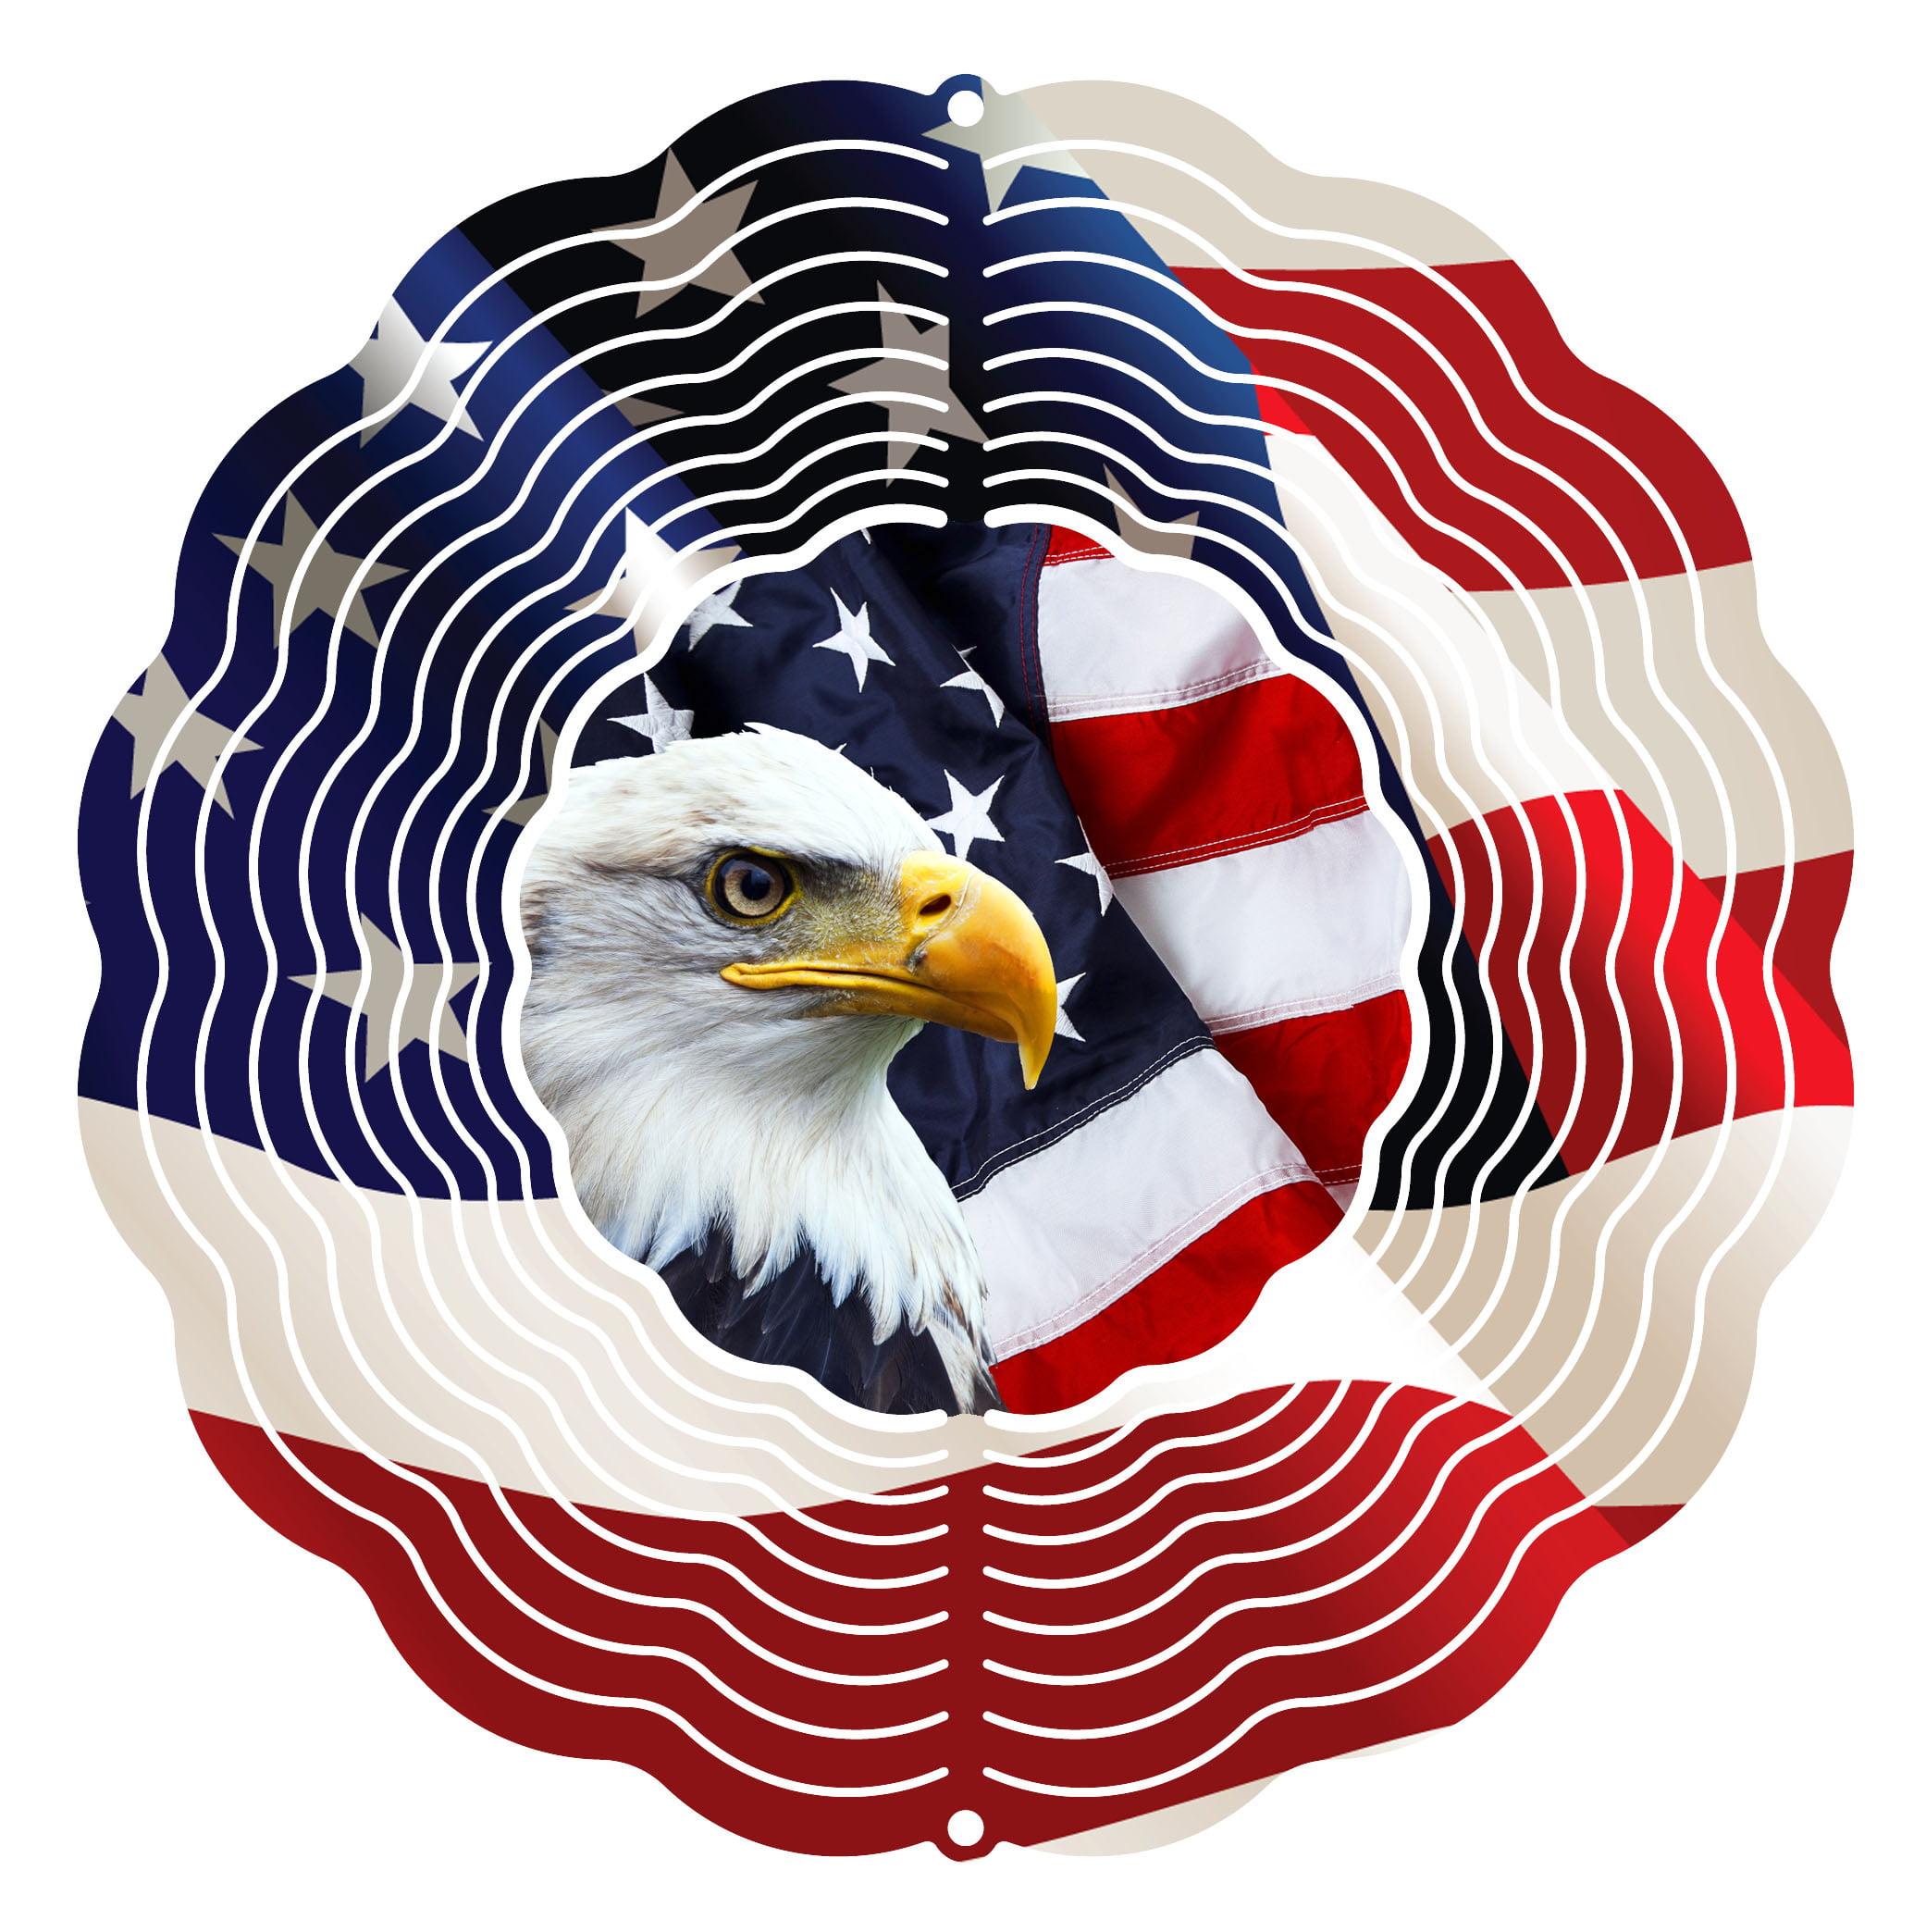 "Garden Wind Spinner Eagle Flag 10"" Wind Spinner by Next Innovations"